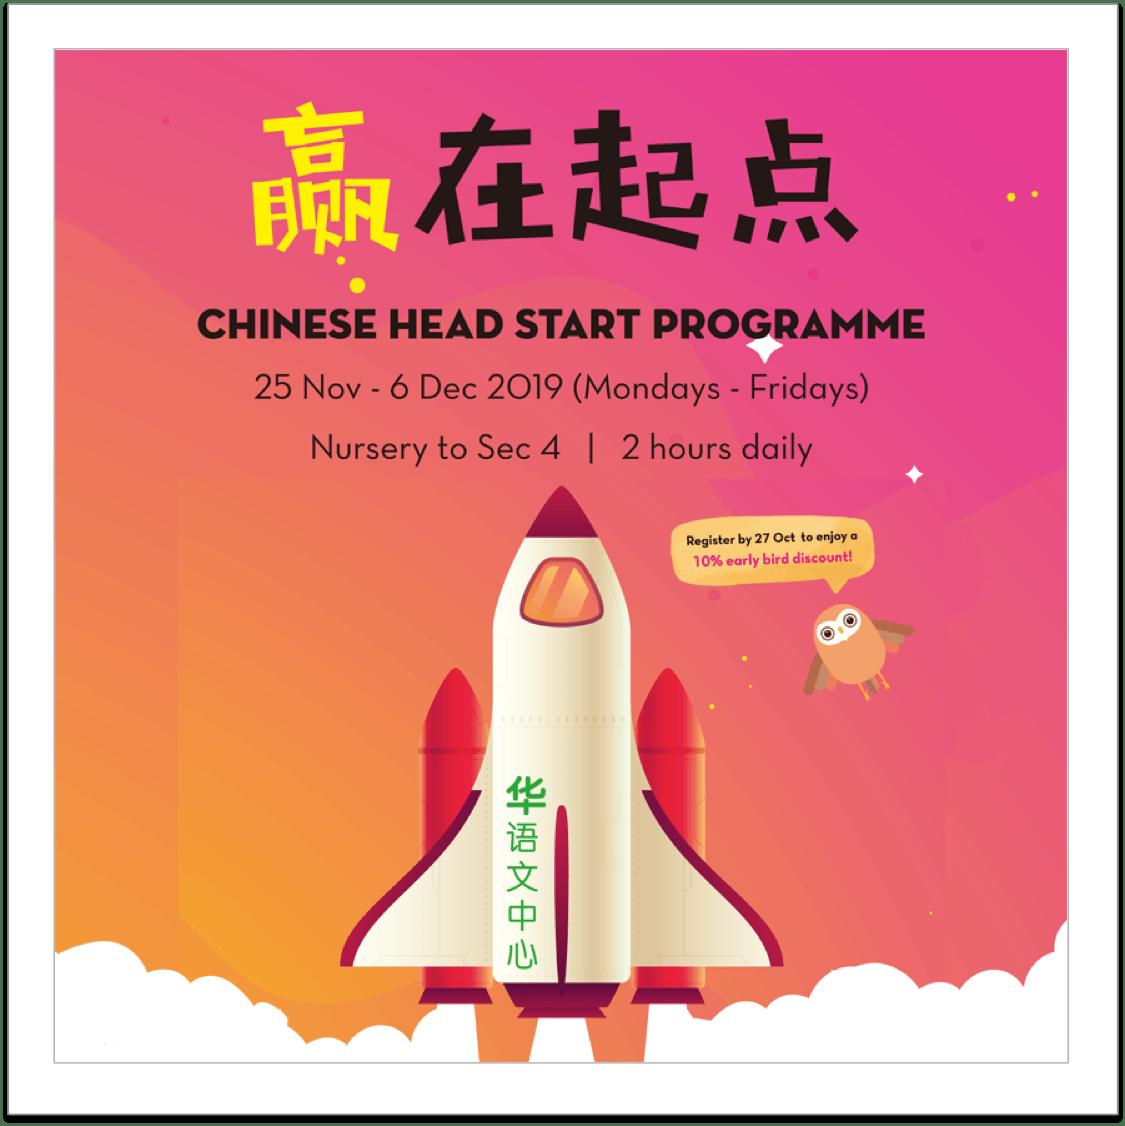 Nov / Dec 2019 Chinese Head Start Programme